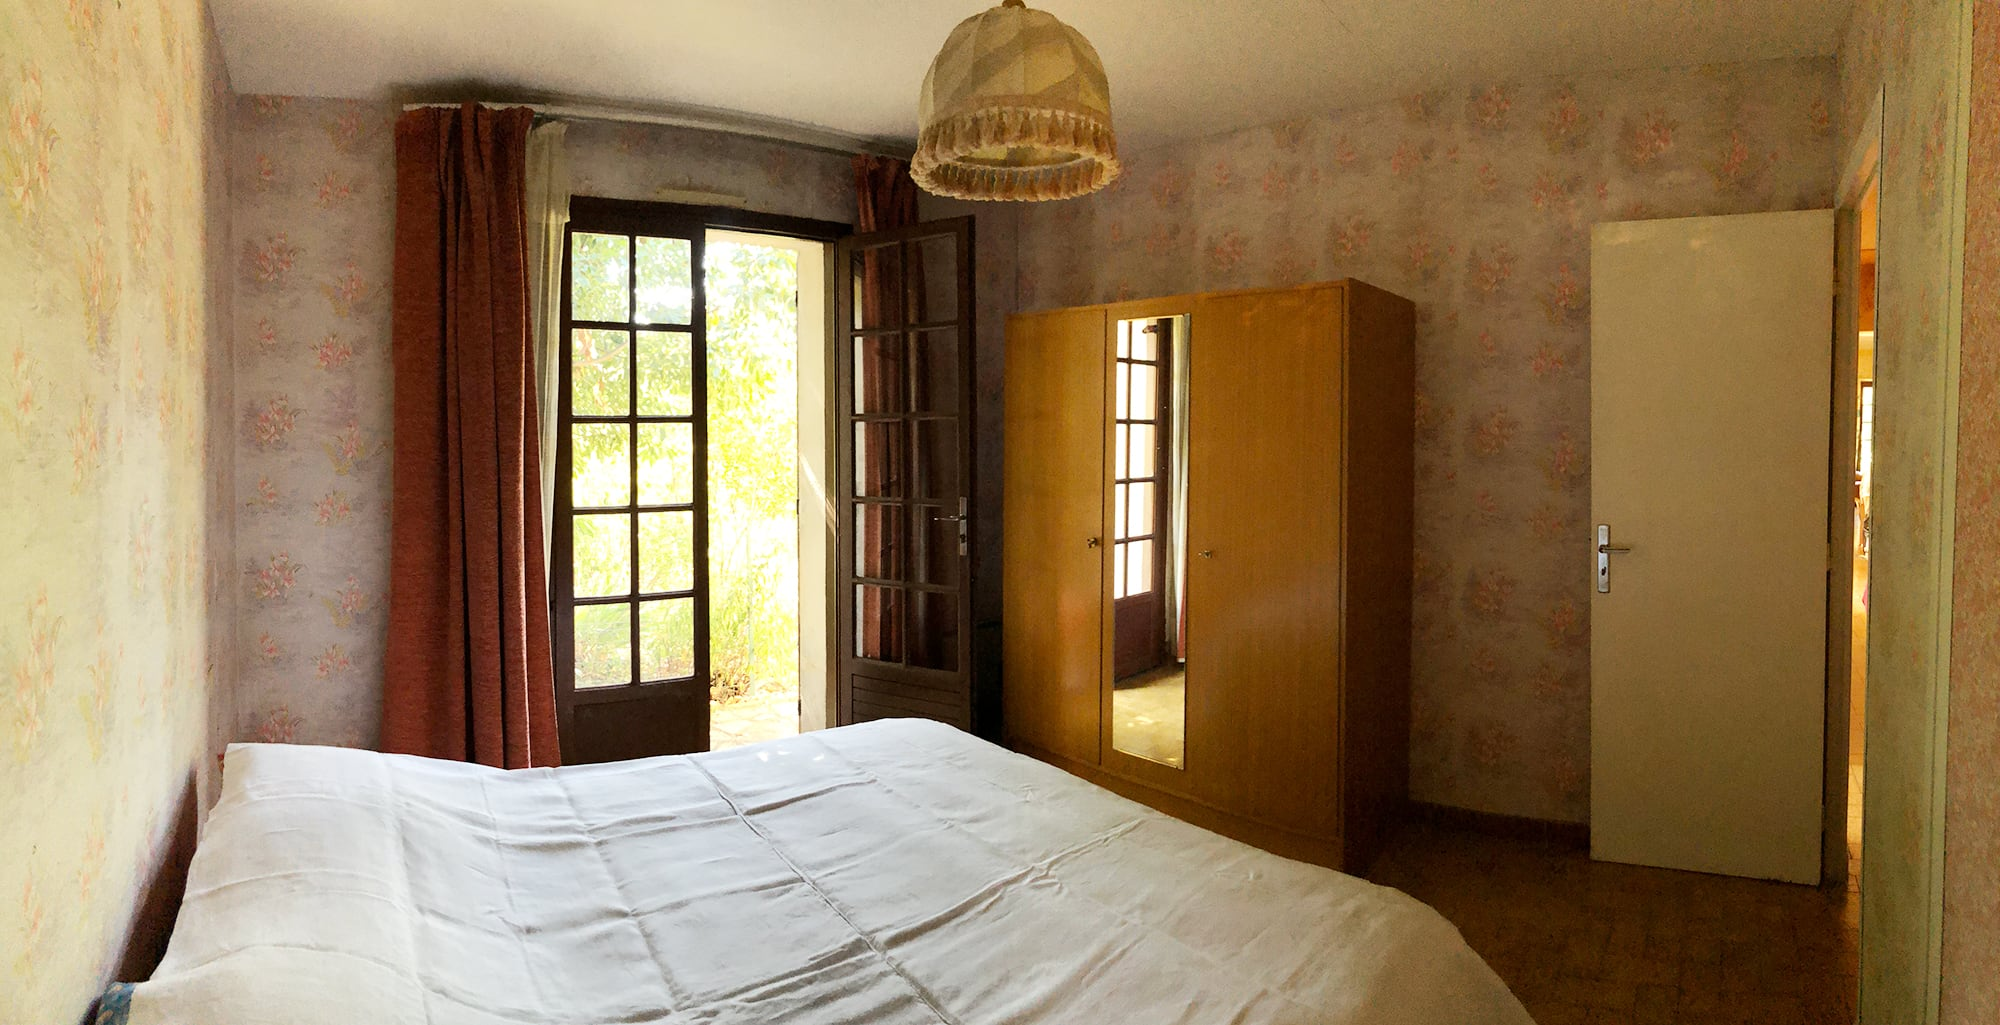 Maison-a-vendre-chambres-05.jpg